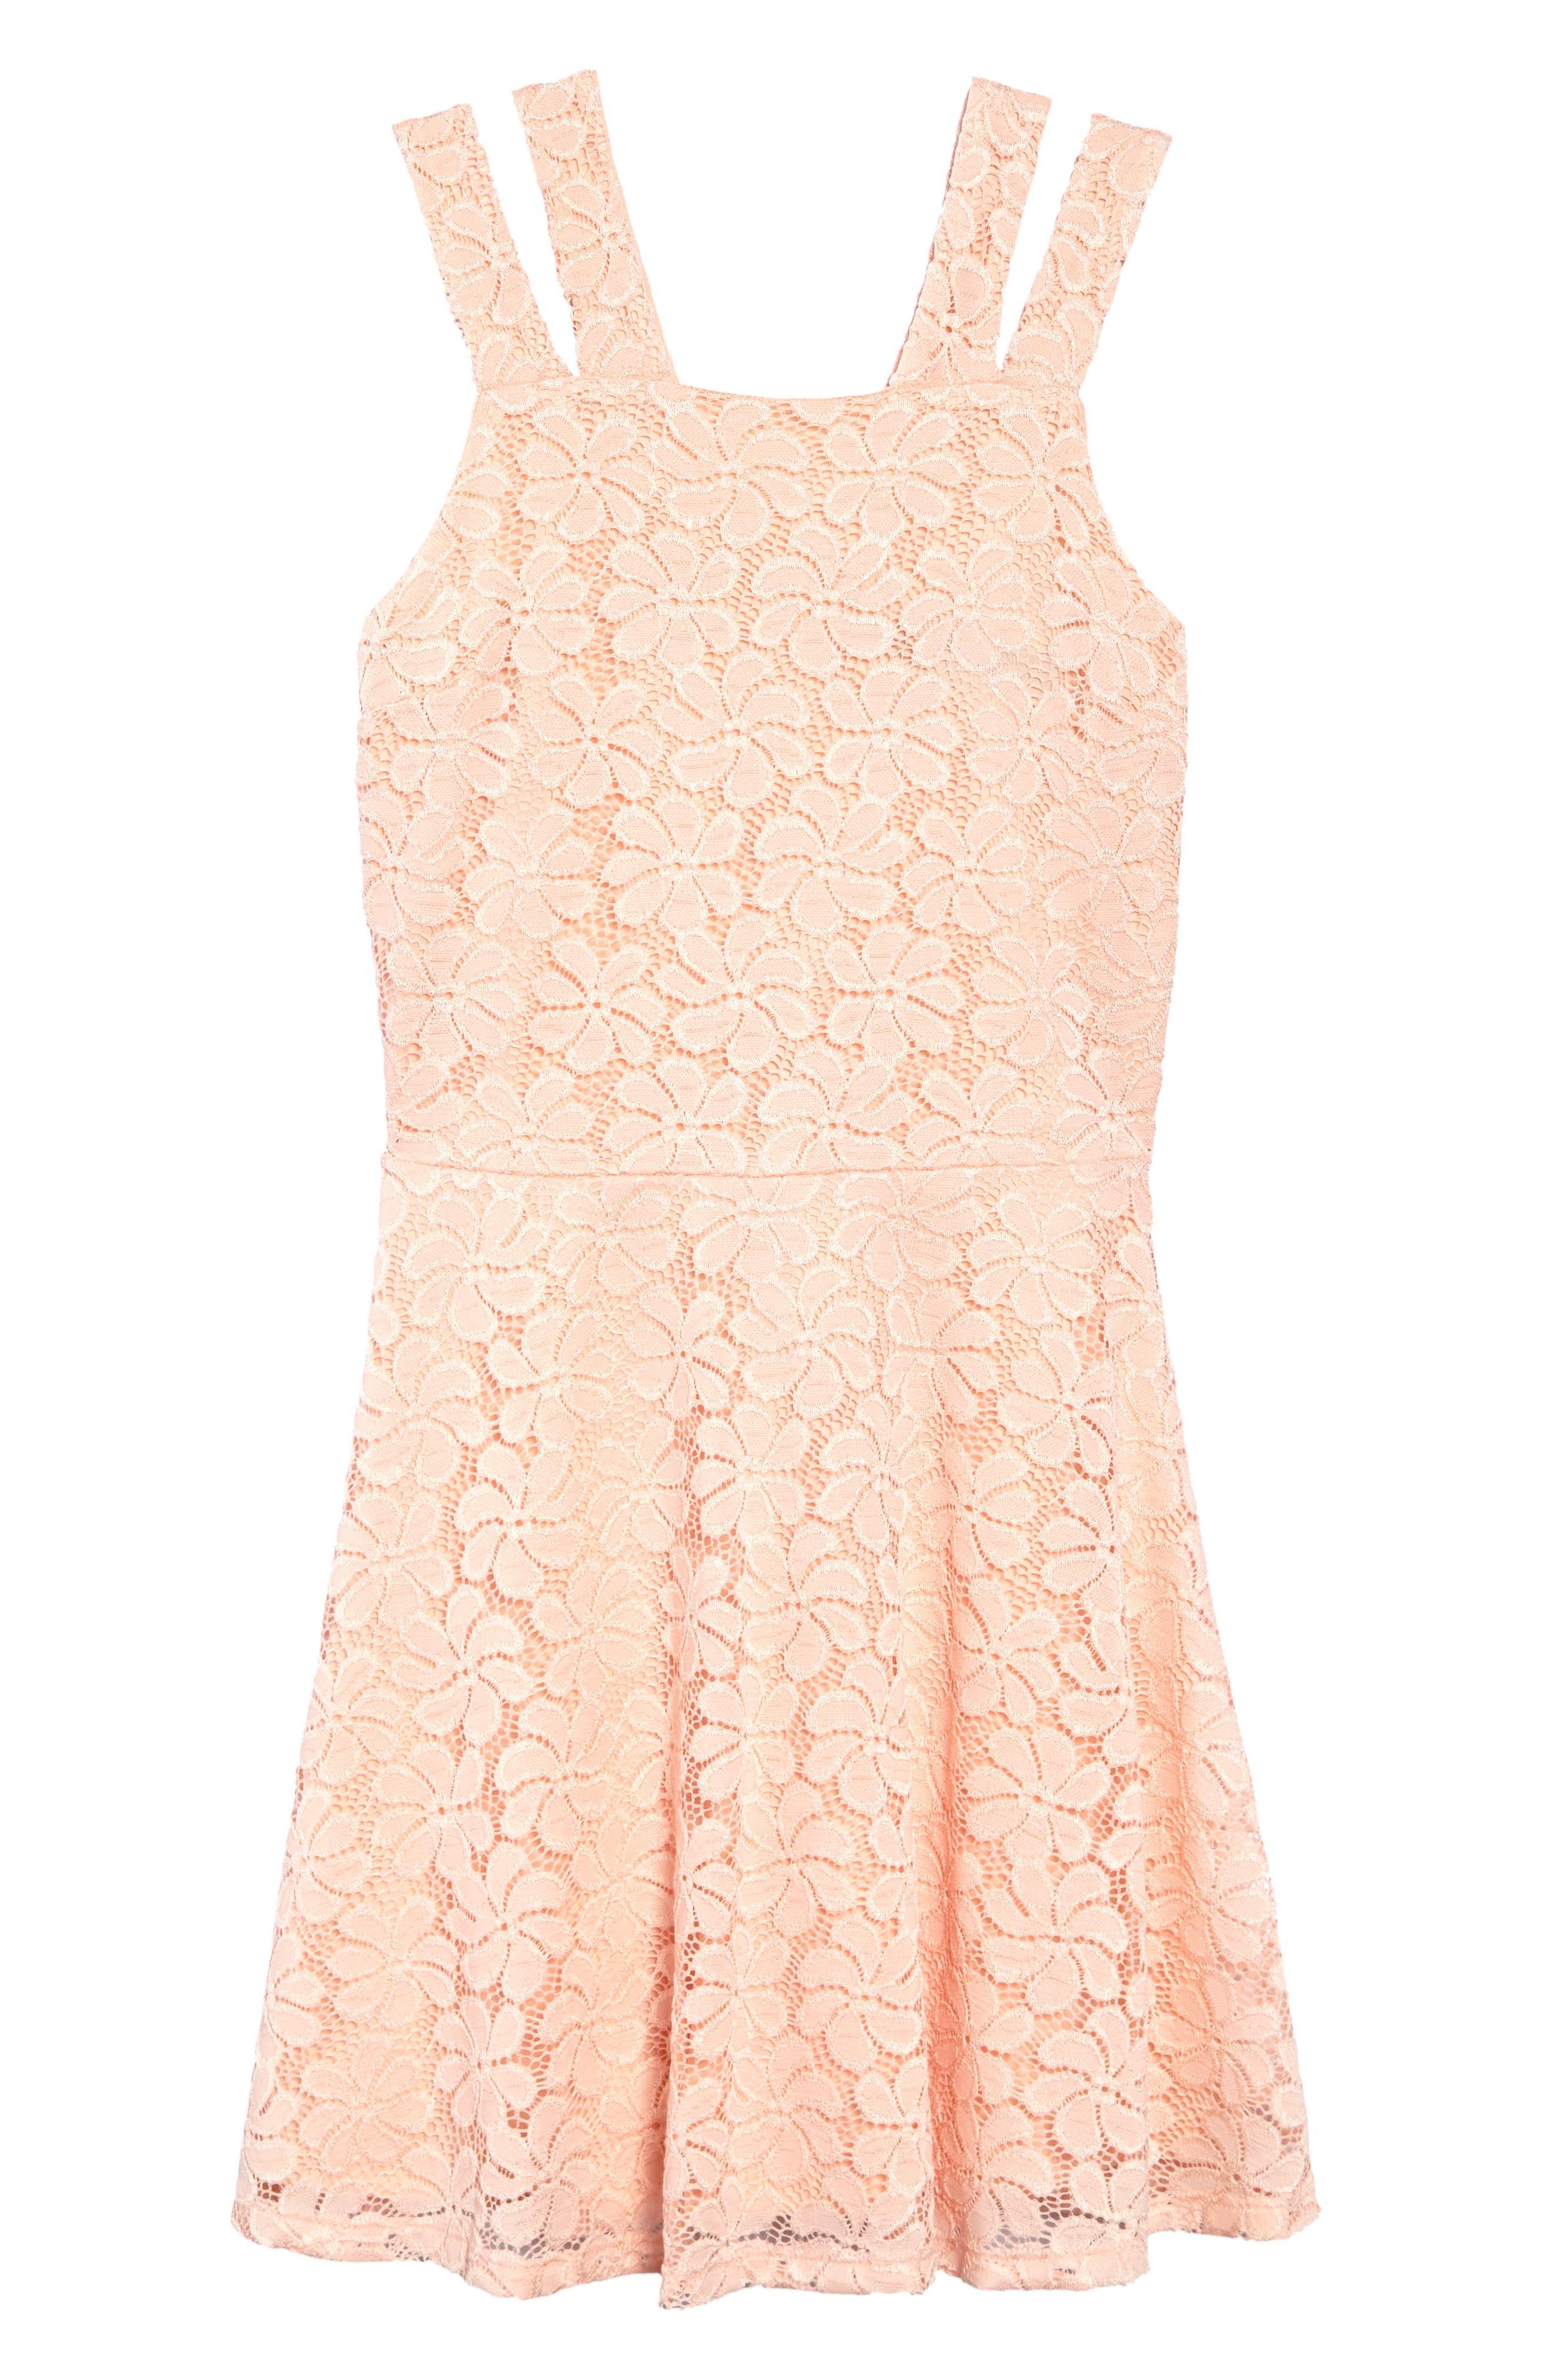 Penelope Tree Nancy Lace Dress (Big Girls)